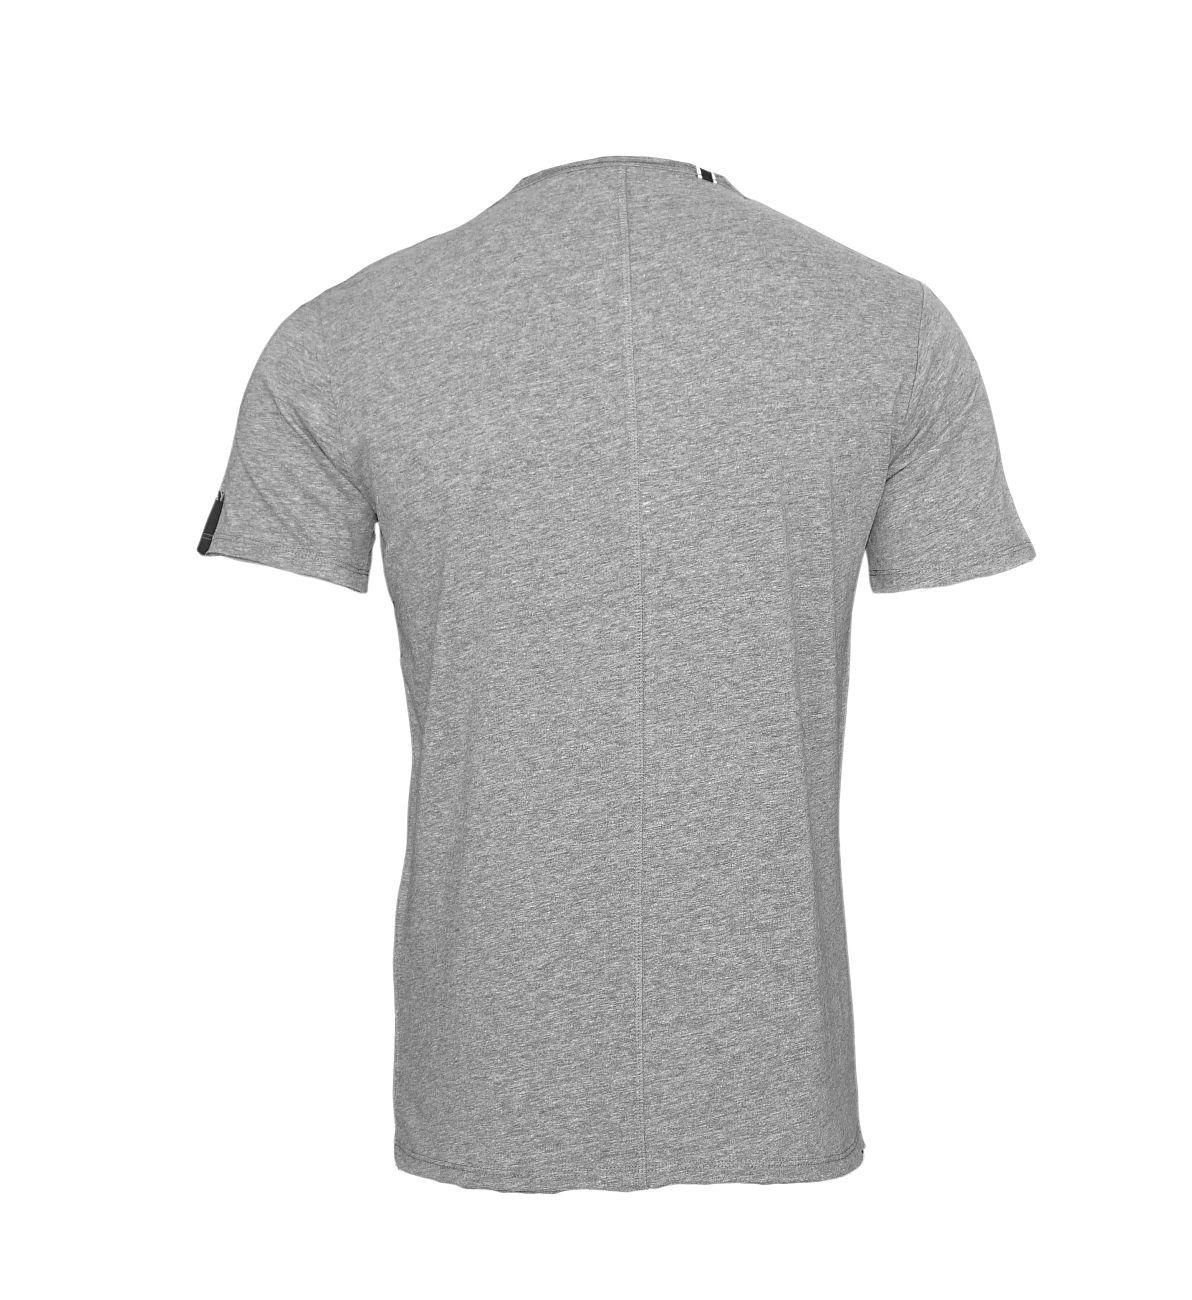 Replay T-Shirt Shirt Rundhals M3590.000 2660.M03 DARK GREY MELANGE S18-RPT2